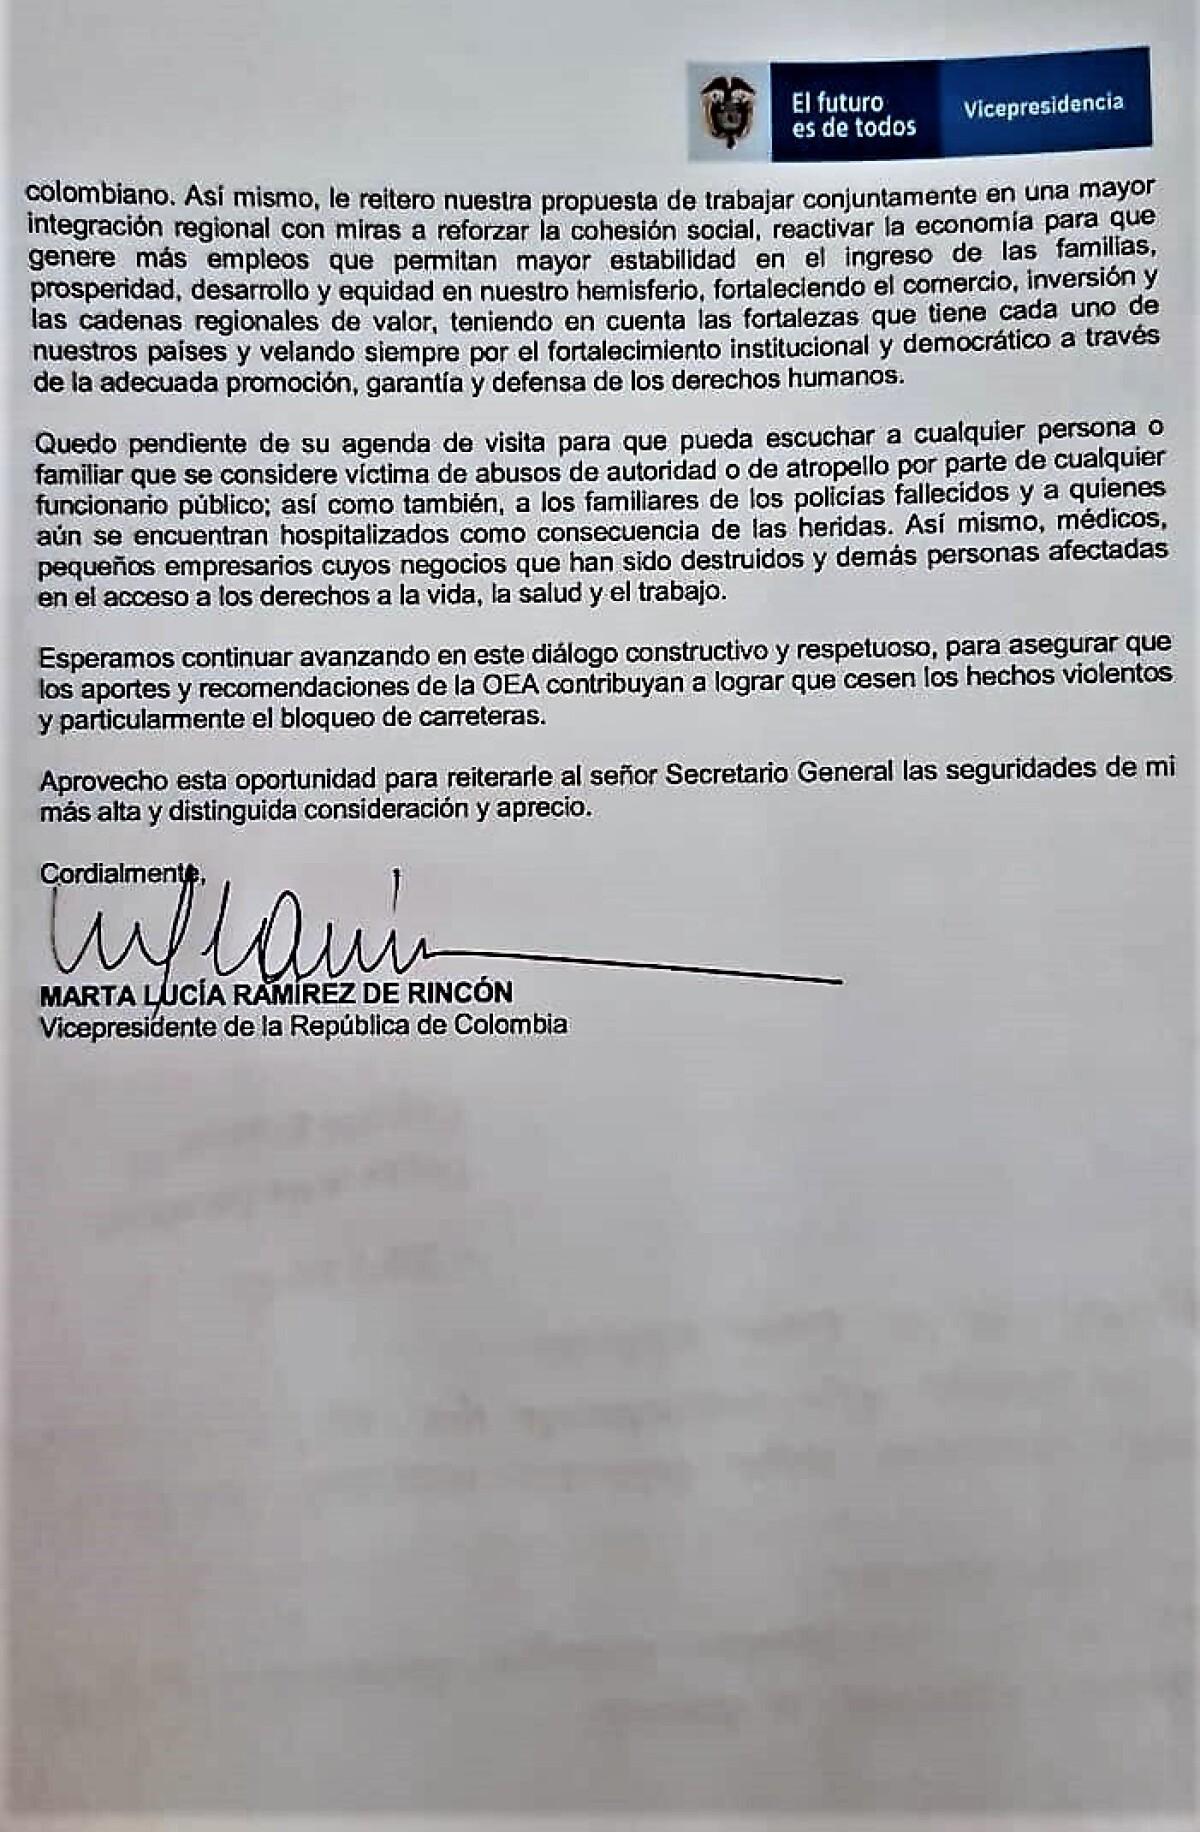 2 Documento Gobierno a Luis Almagro (OEA)